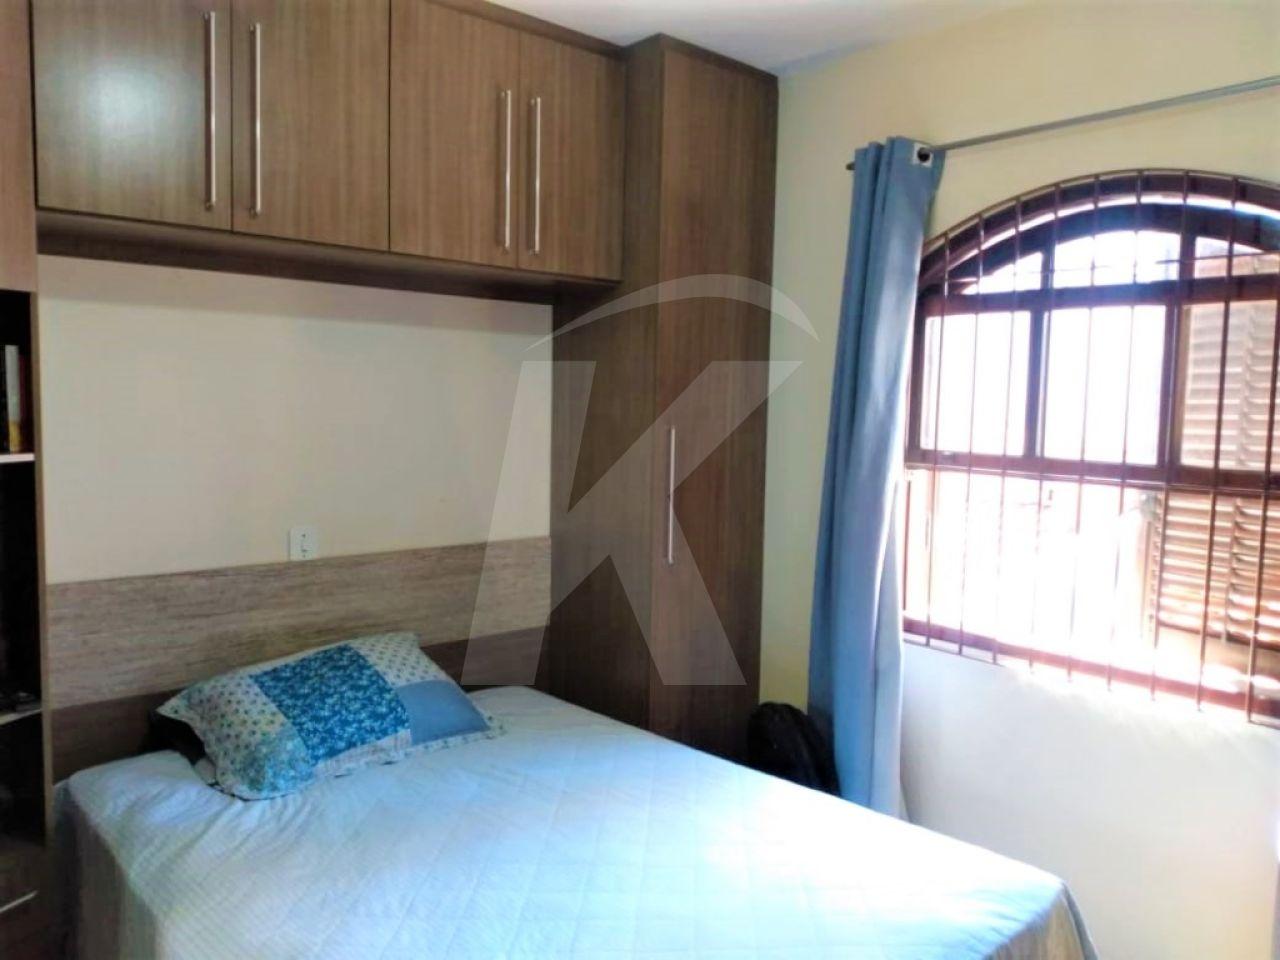 Sobrado Tucuruvi - 3 Dormitório(s) - São Paulo - SP - REF. KA13448